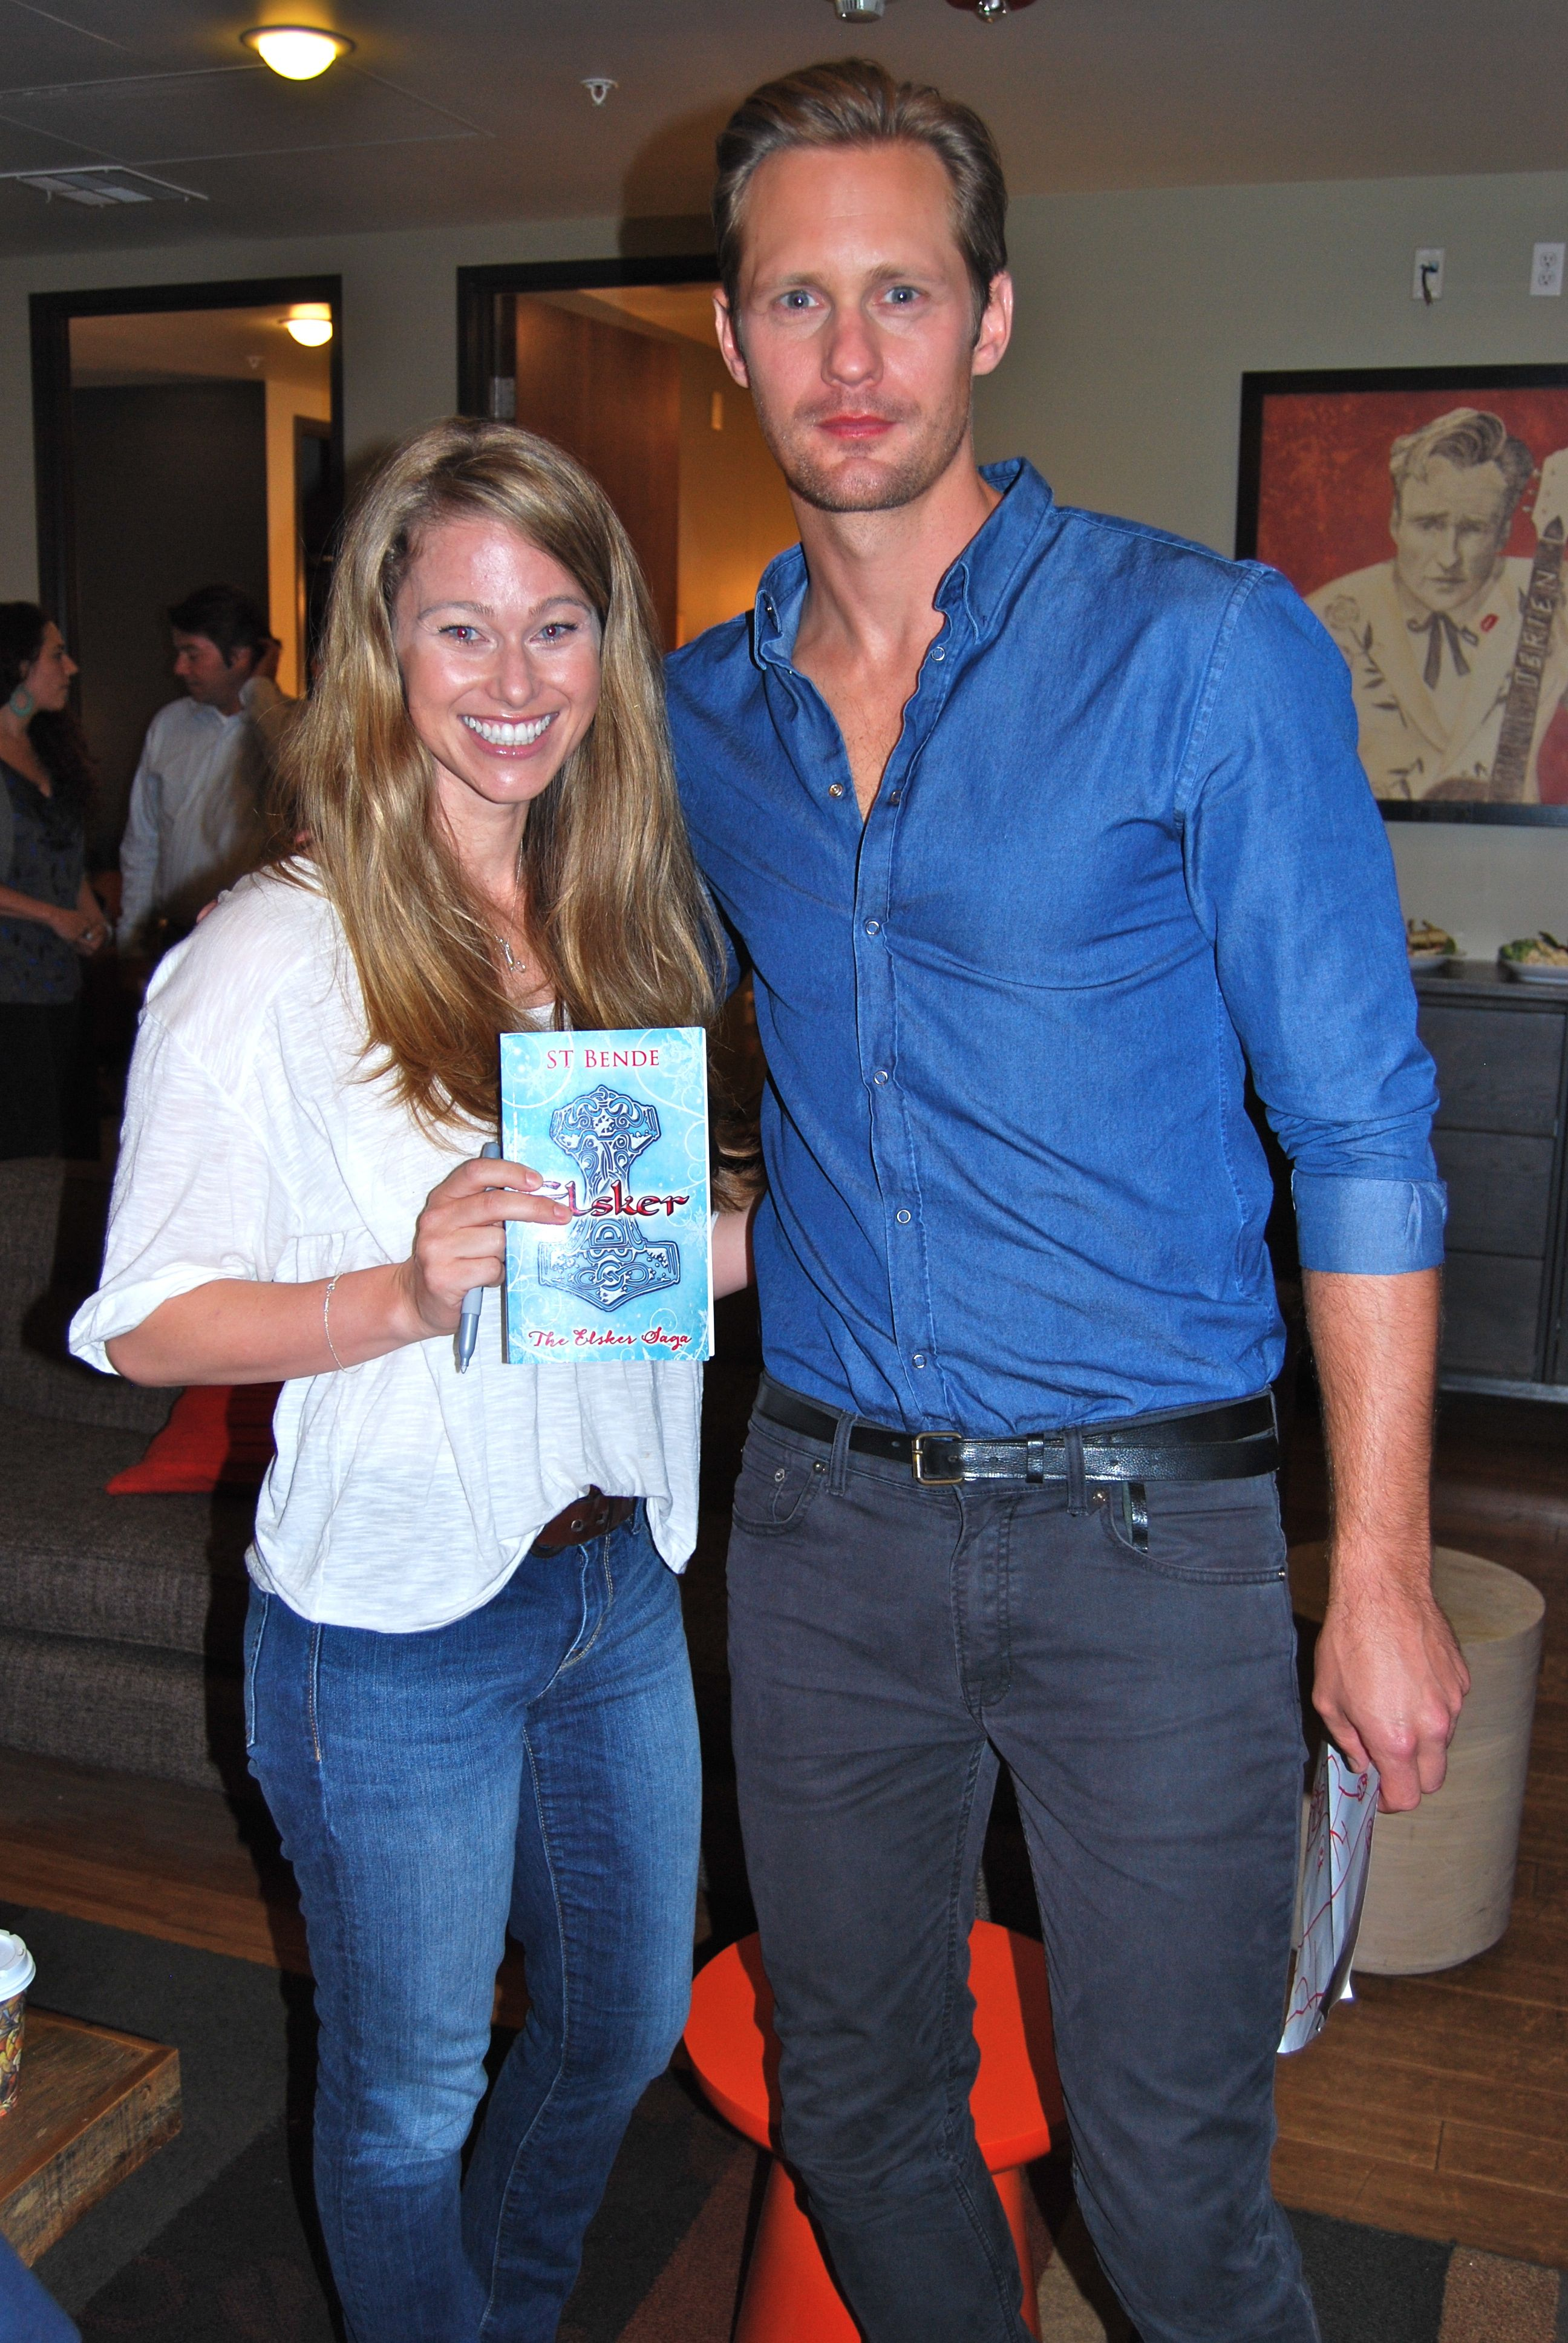 My author ST Bende and her book ELSKER, which True Blood star Alexander Skarsgård signed for her in LA :)